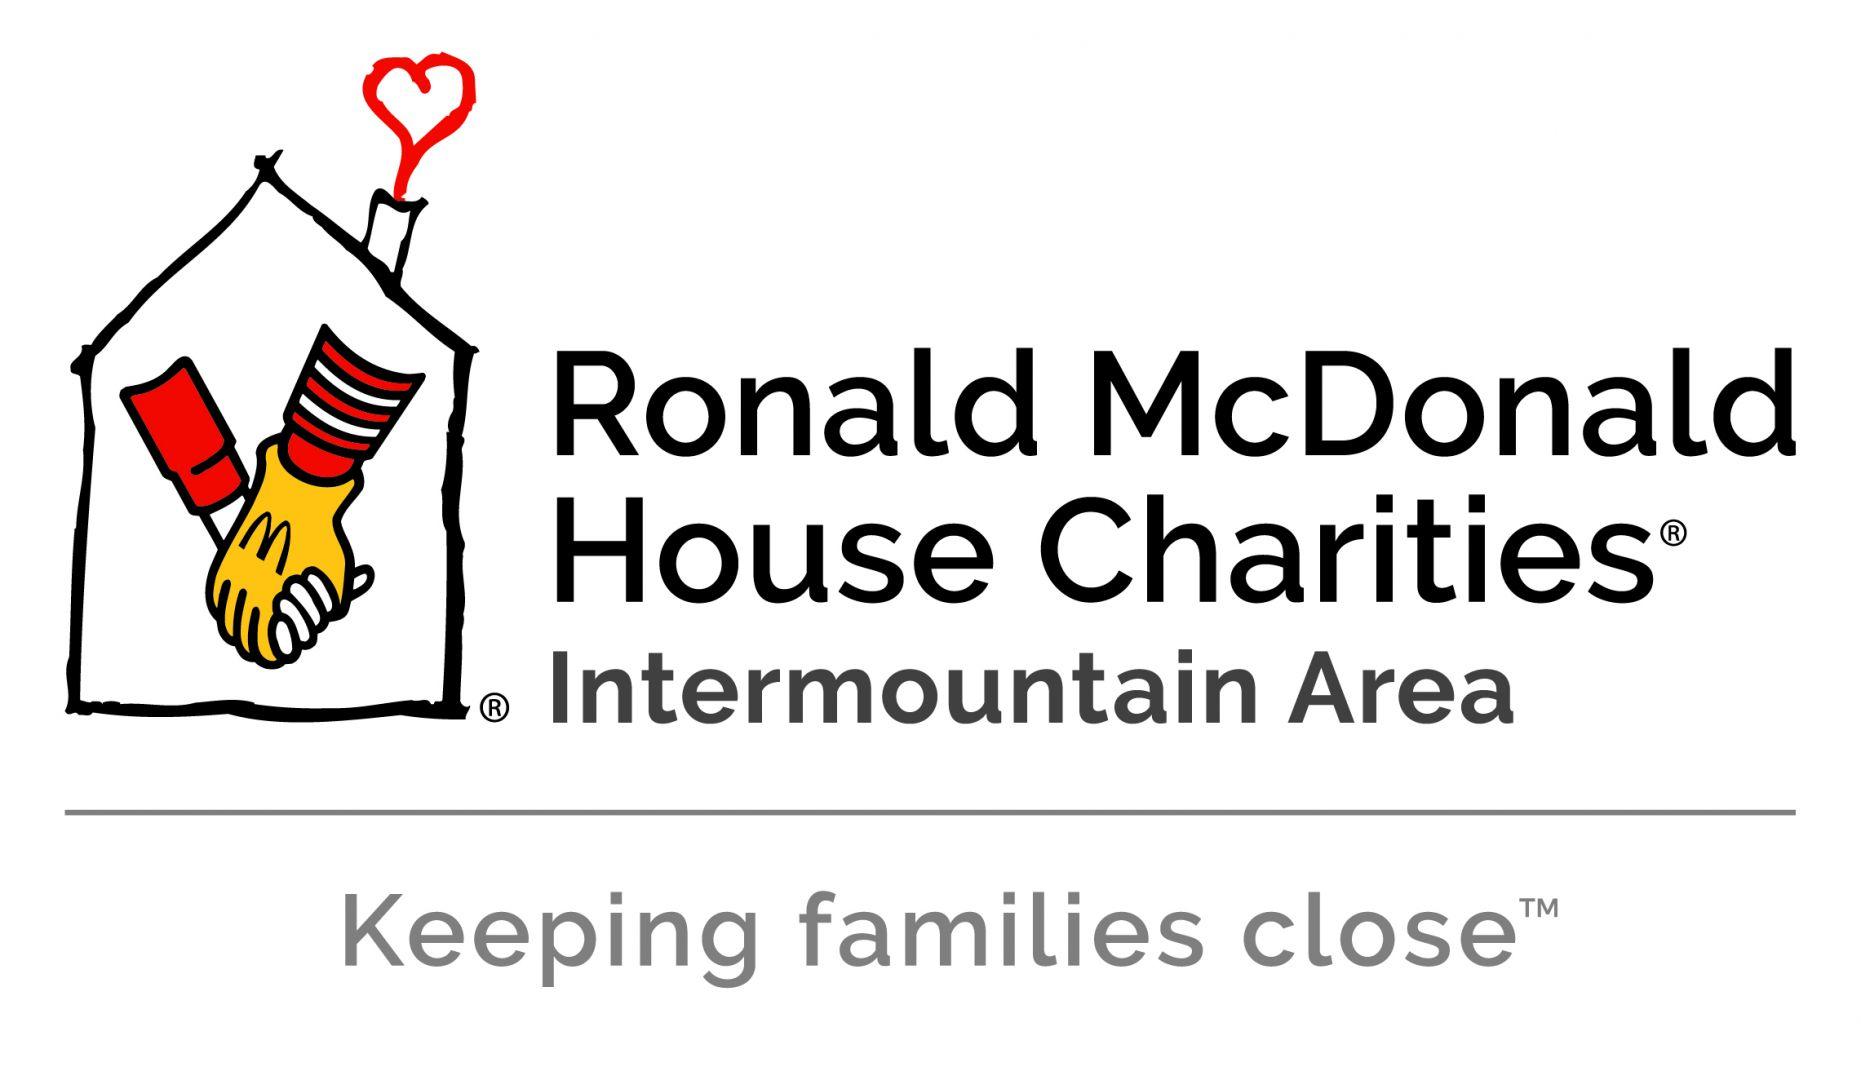 Employment Opportunities - Ronald McDonald House Charities